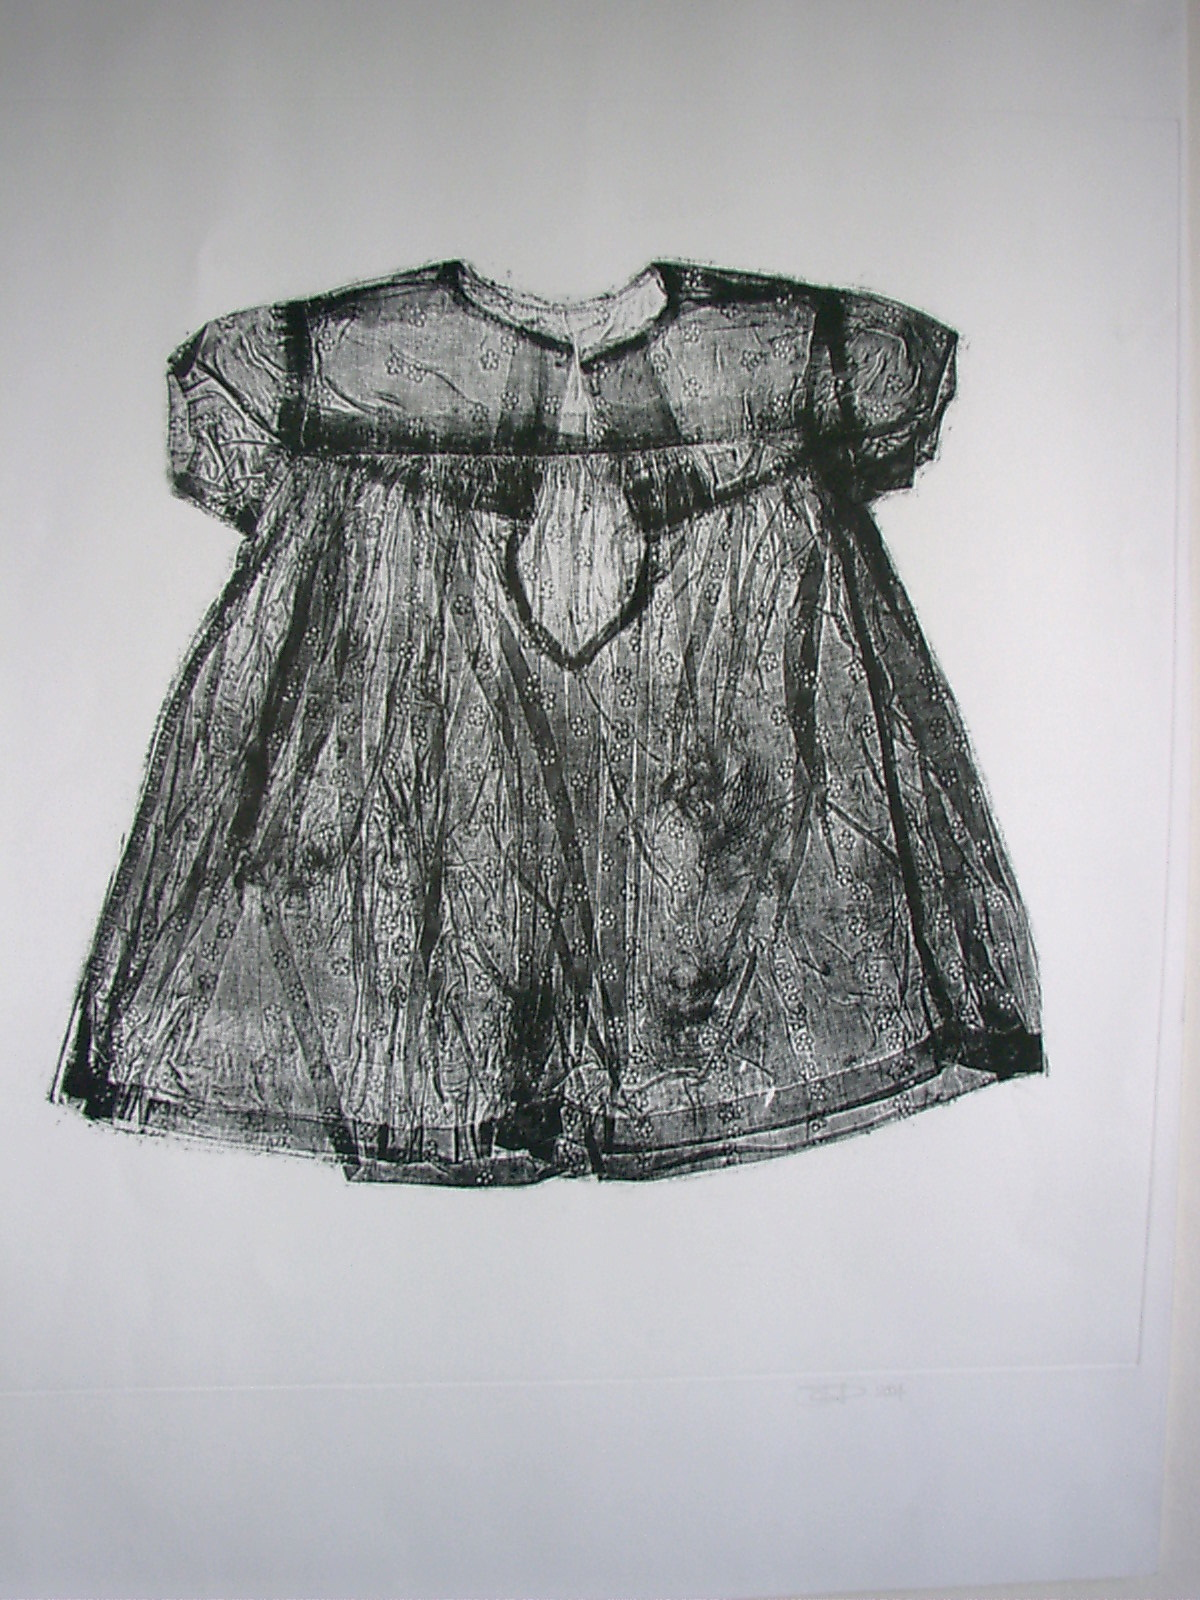 ETCHING - GIRLS DRESS